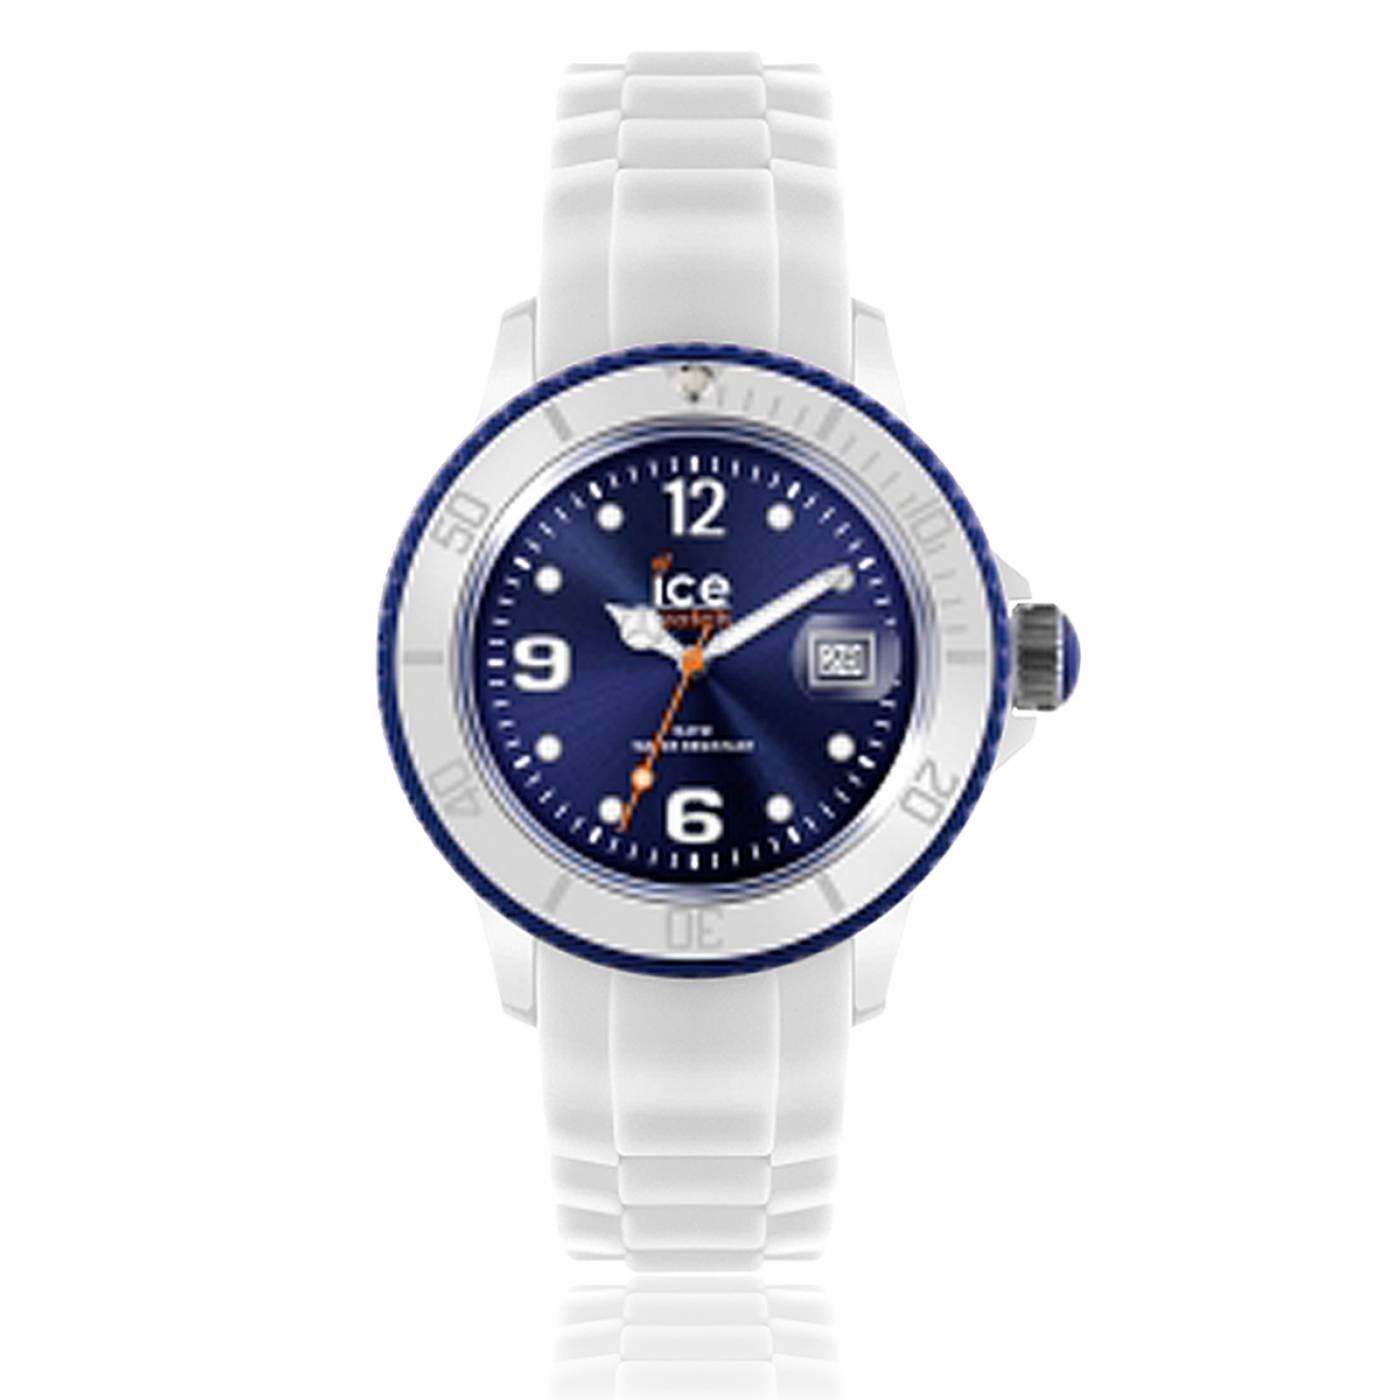 Montre ice watch bleu marine - Montre ice watch bleu turquoise ...